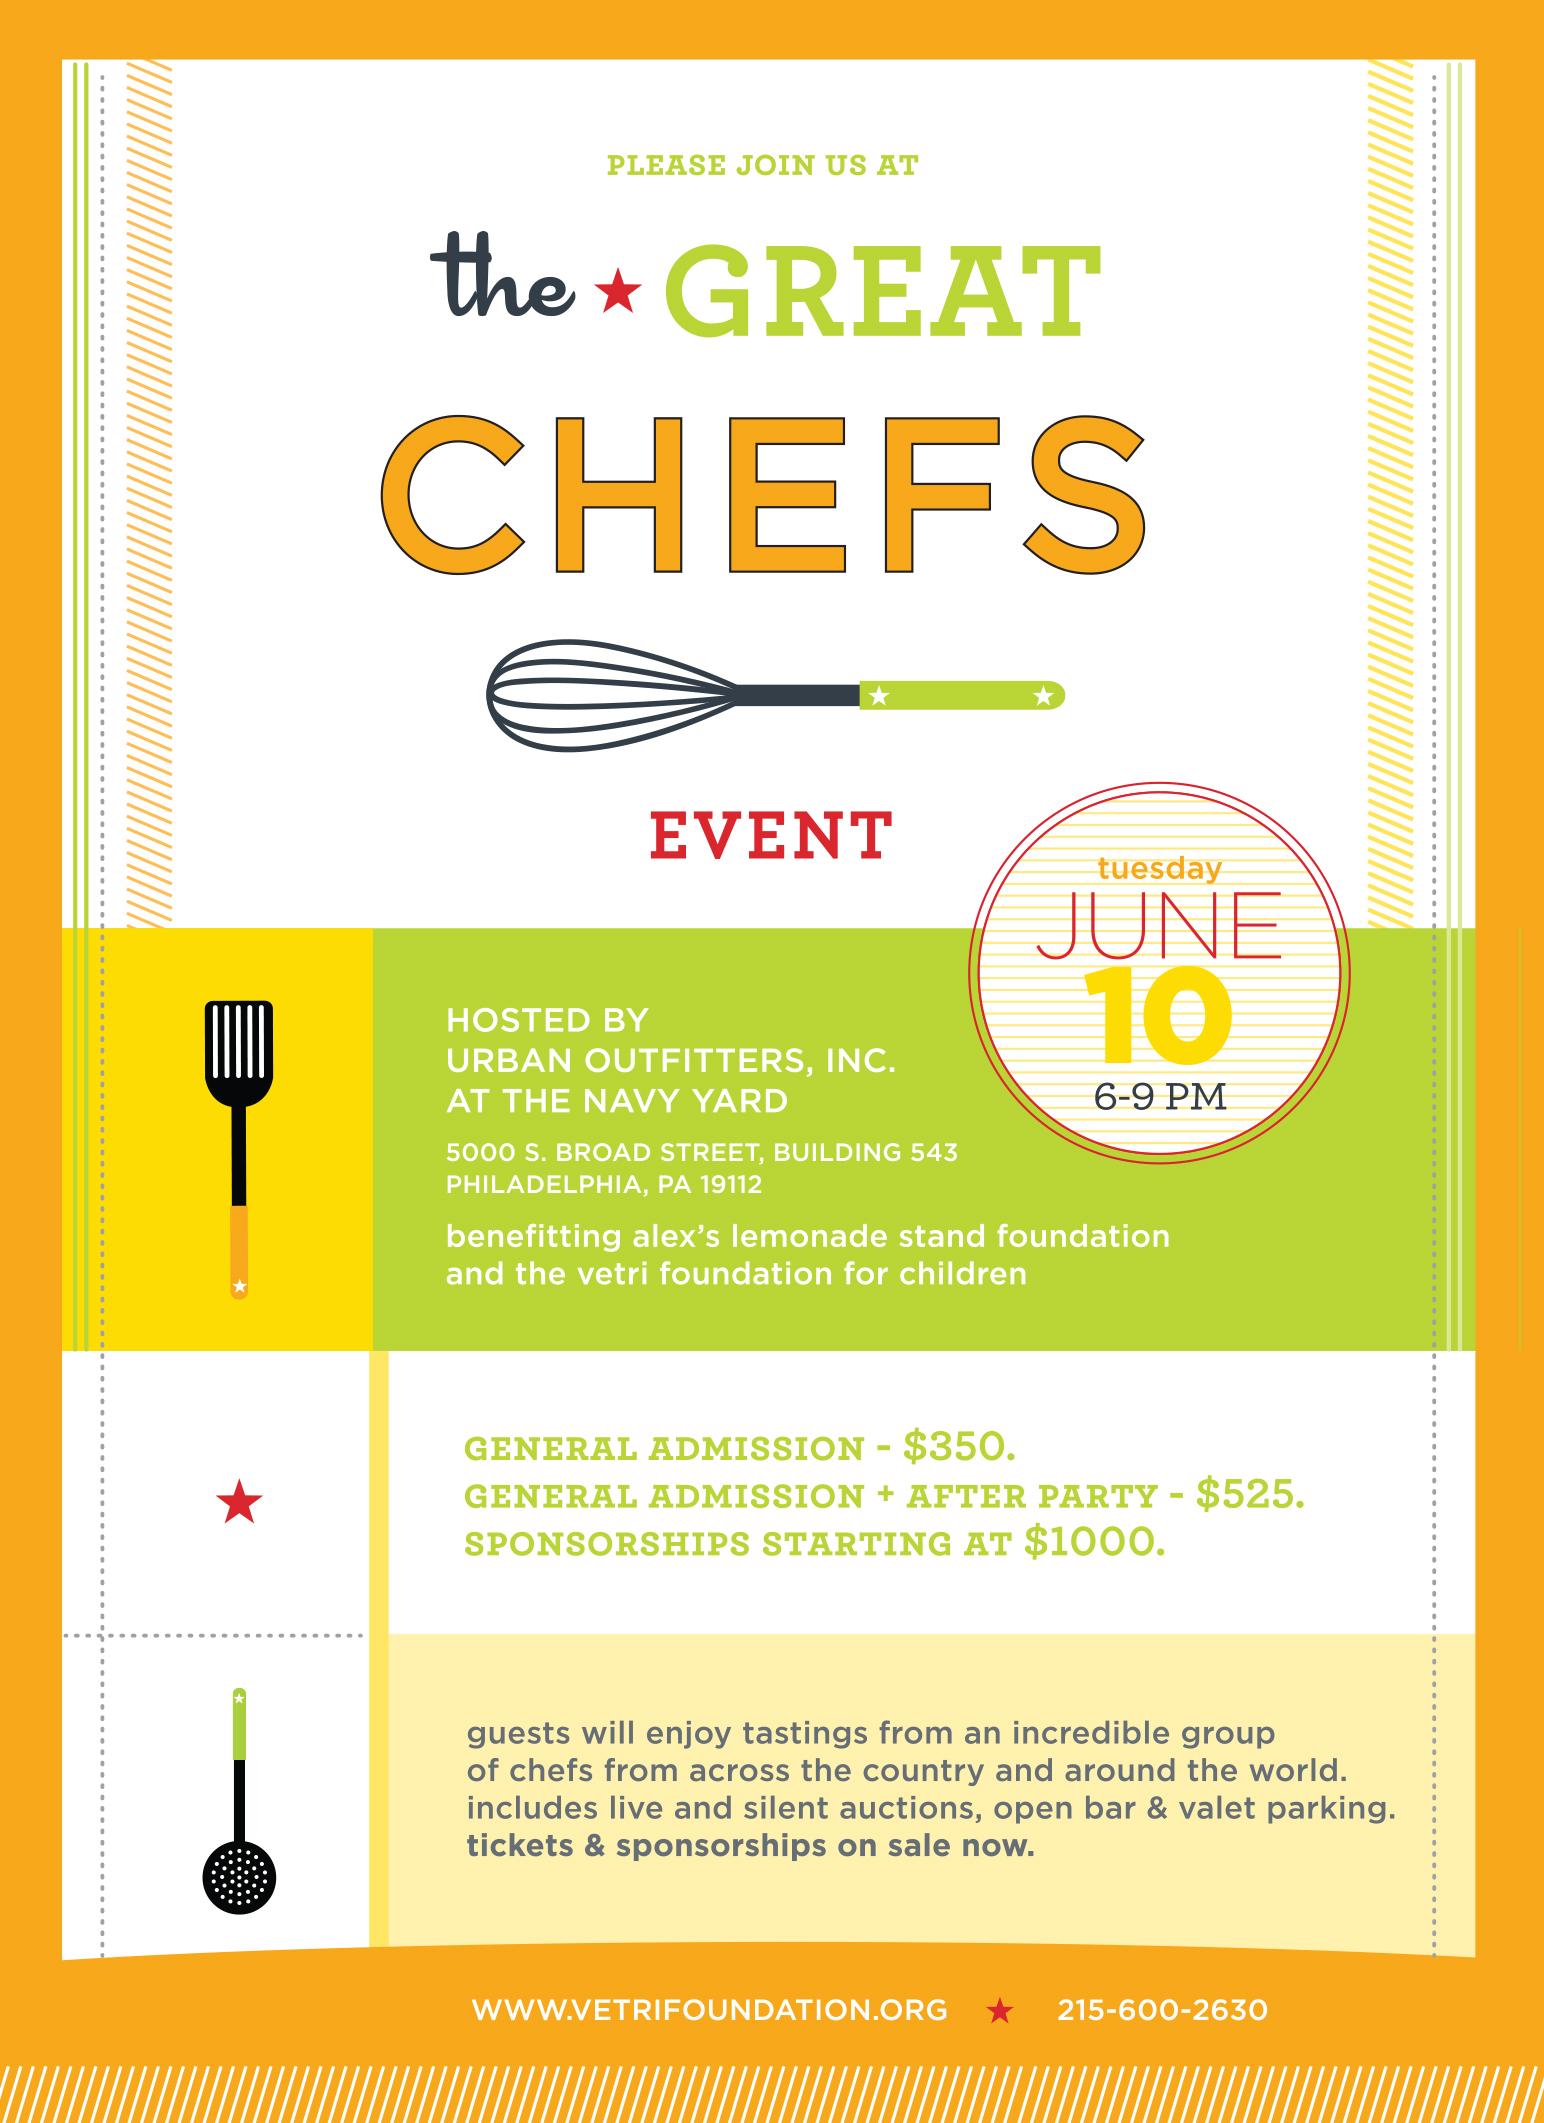 Great Chefs Invite 2014.jpg